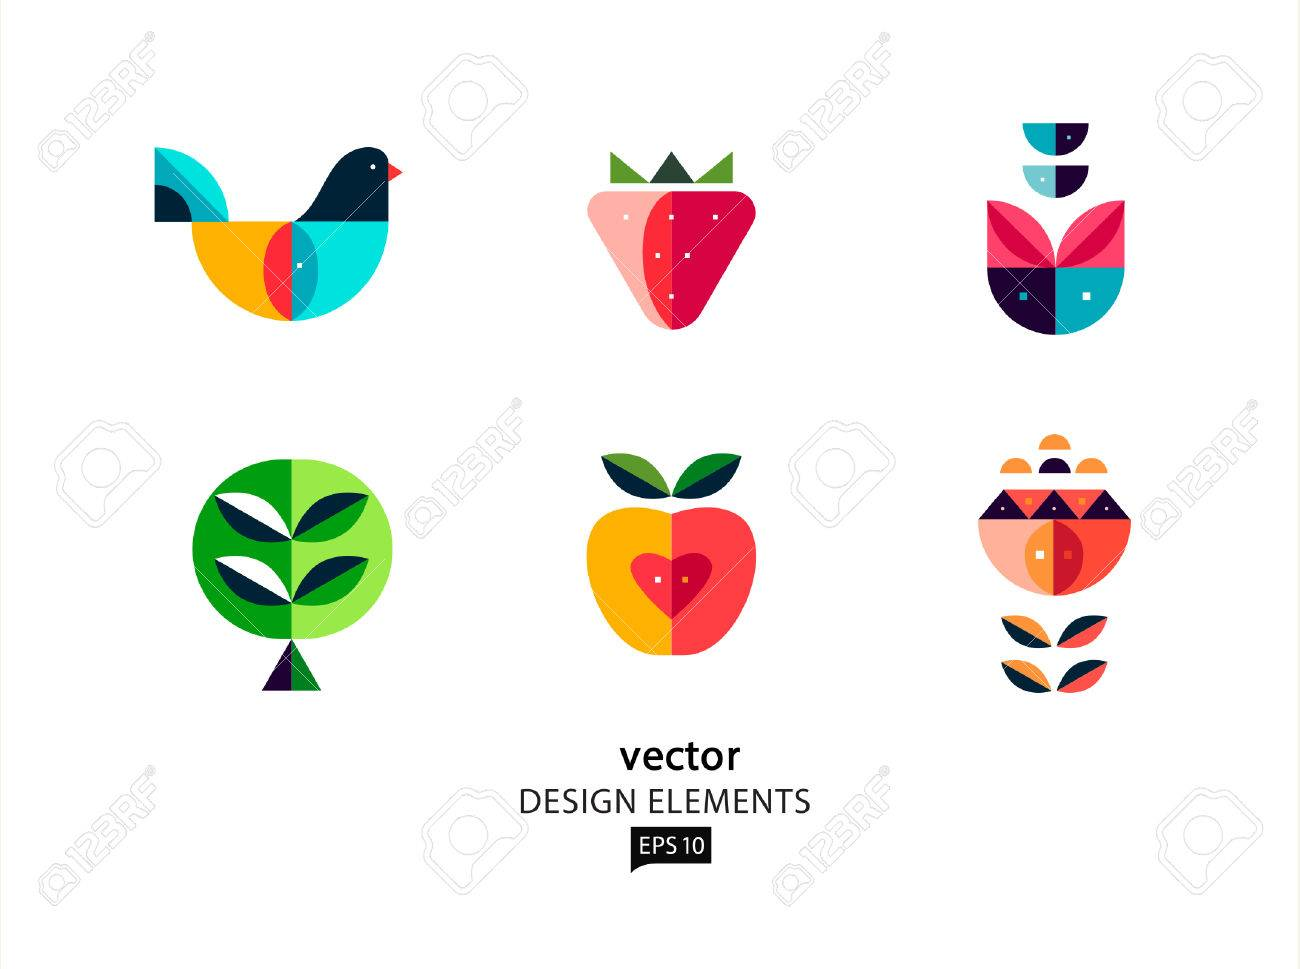 Vector design elements geometric bird and flower - 38662567